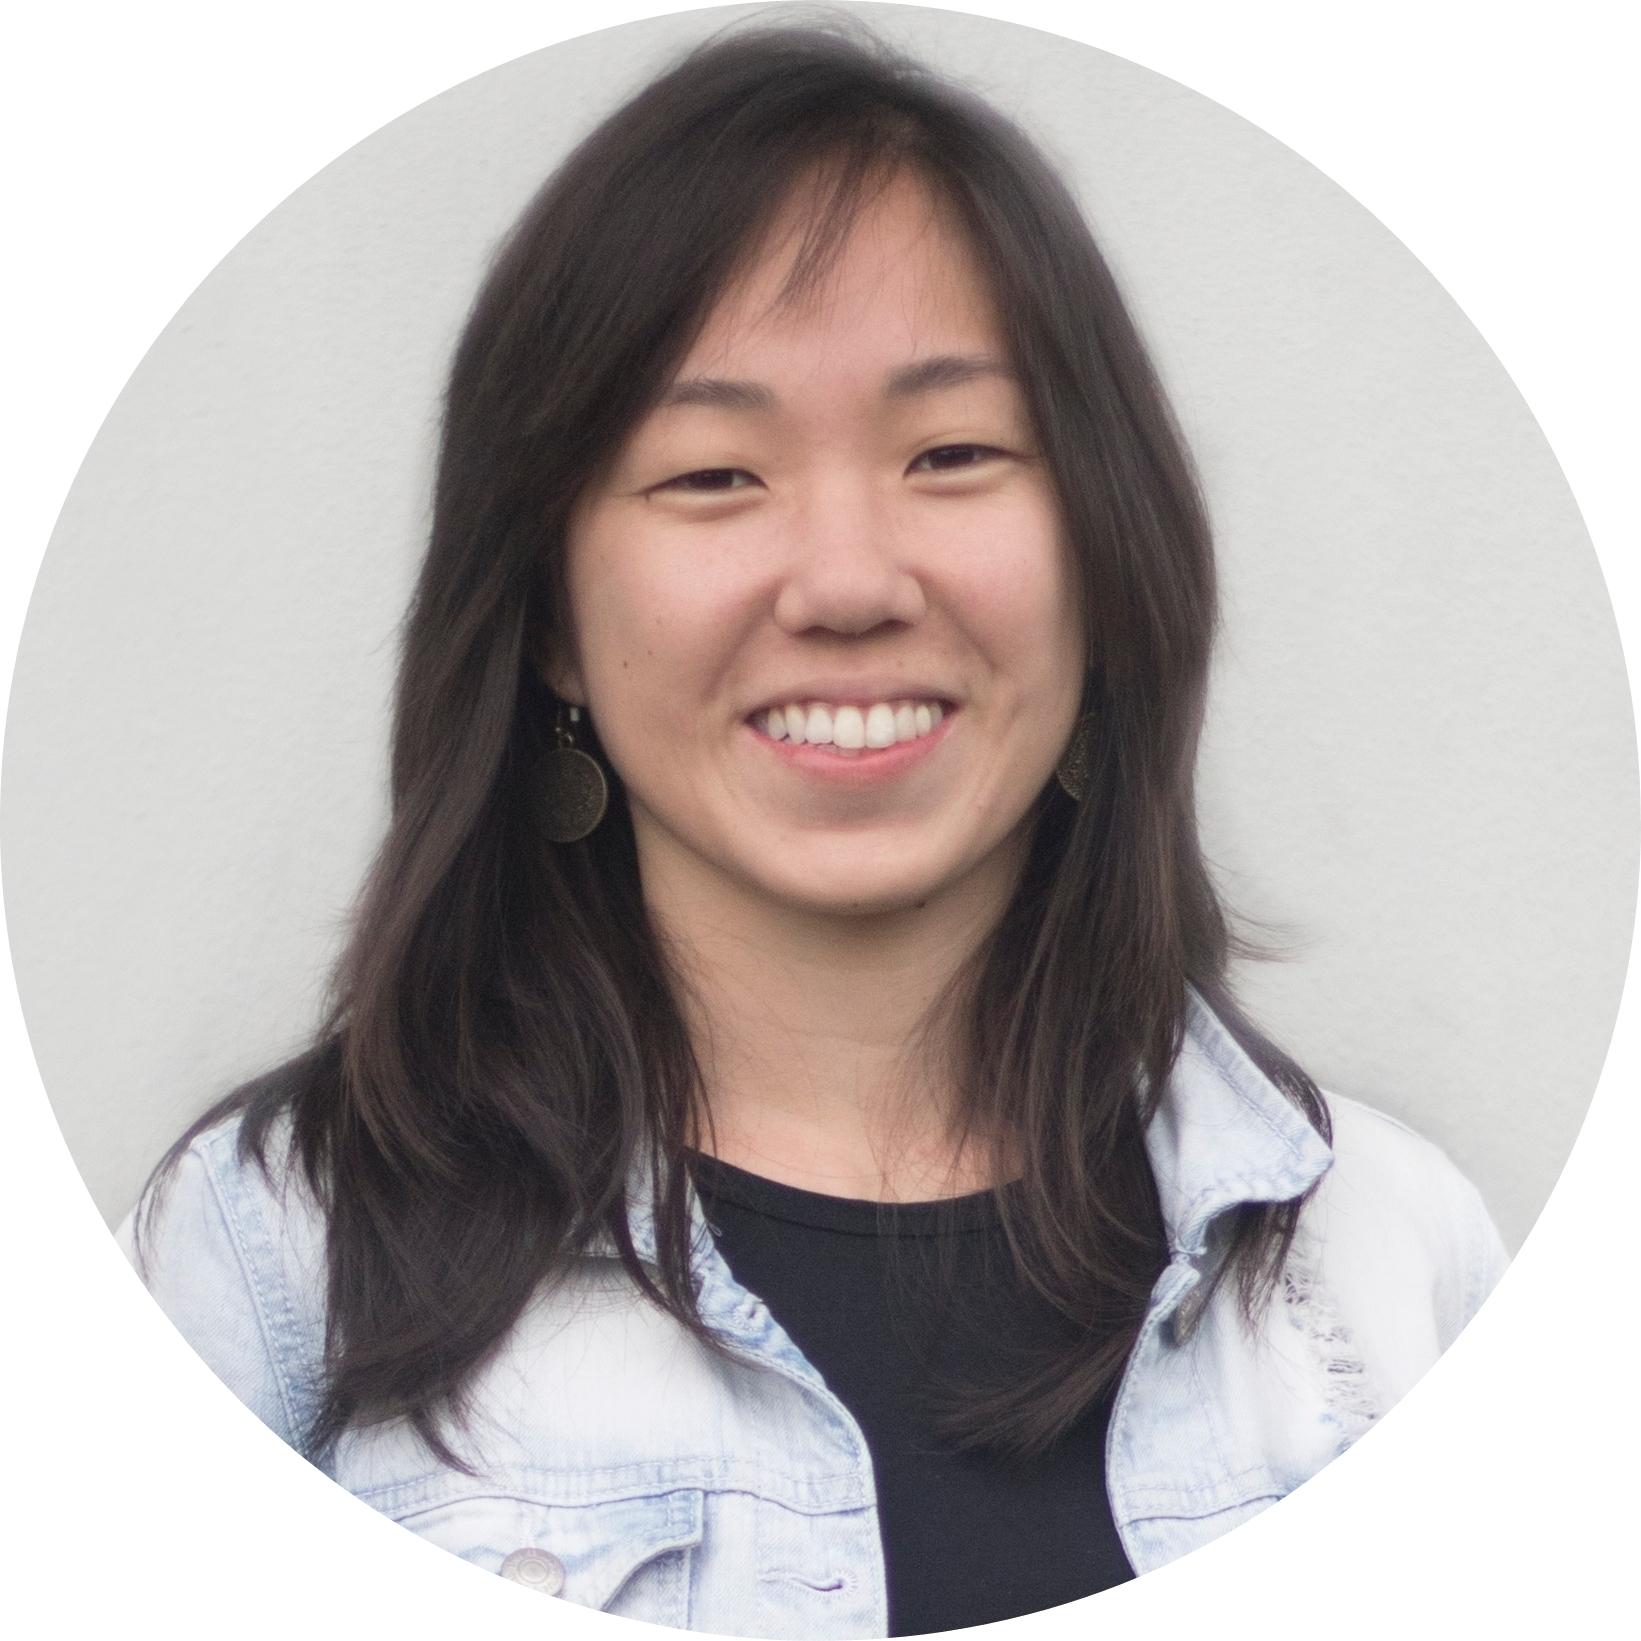 Mariana Horigome - Project Oceanographer and Marketing Coordinator